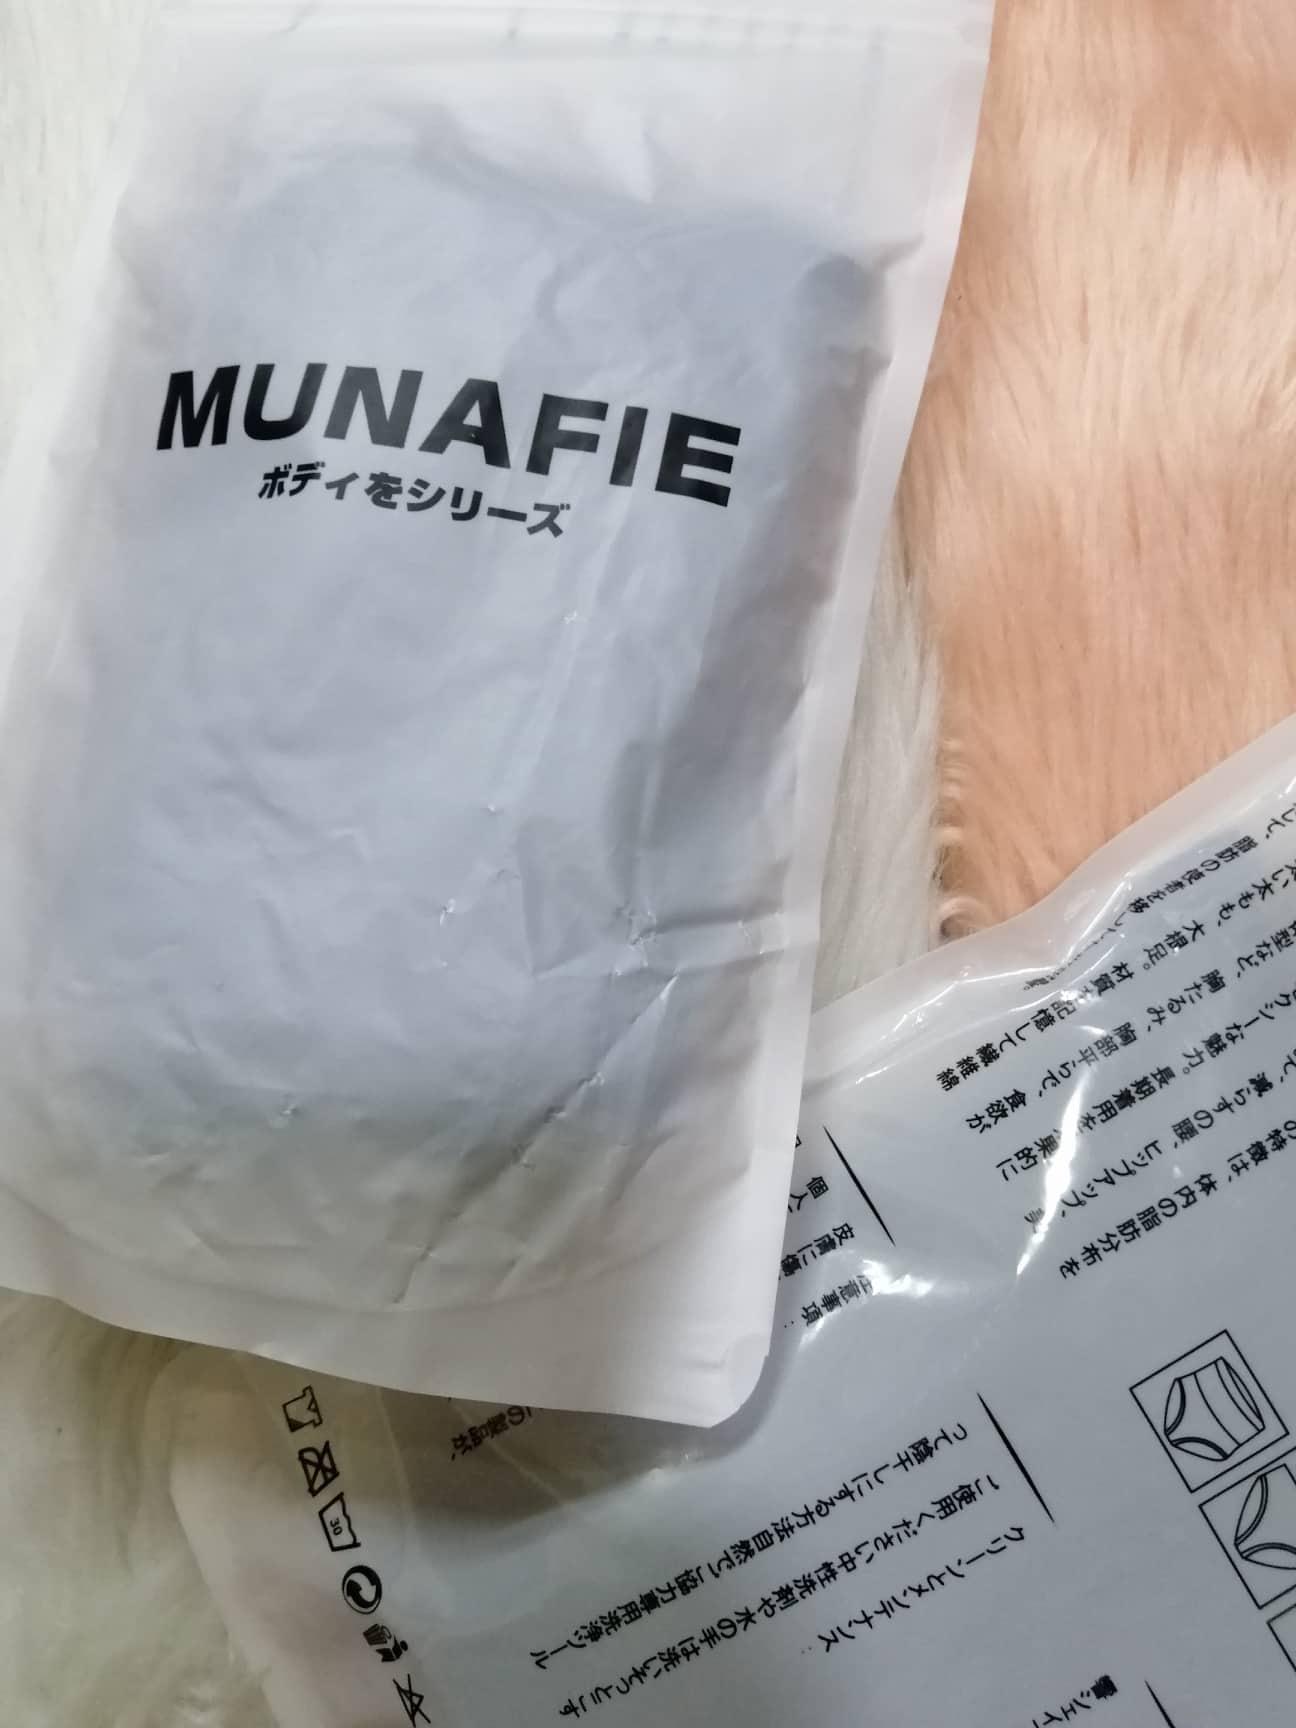 dff2716e66 Munafie Philippines  Munafie price list - Slimming Panty